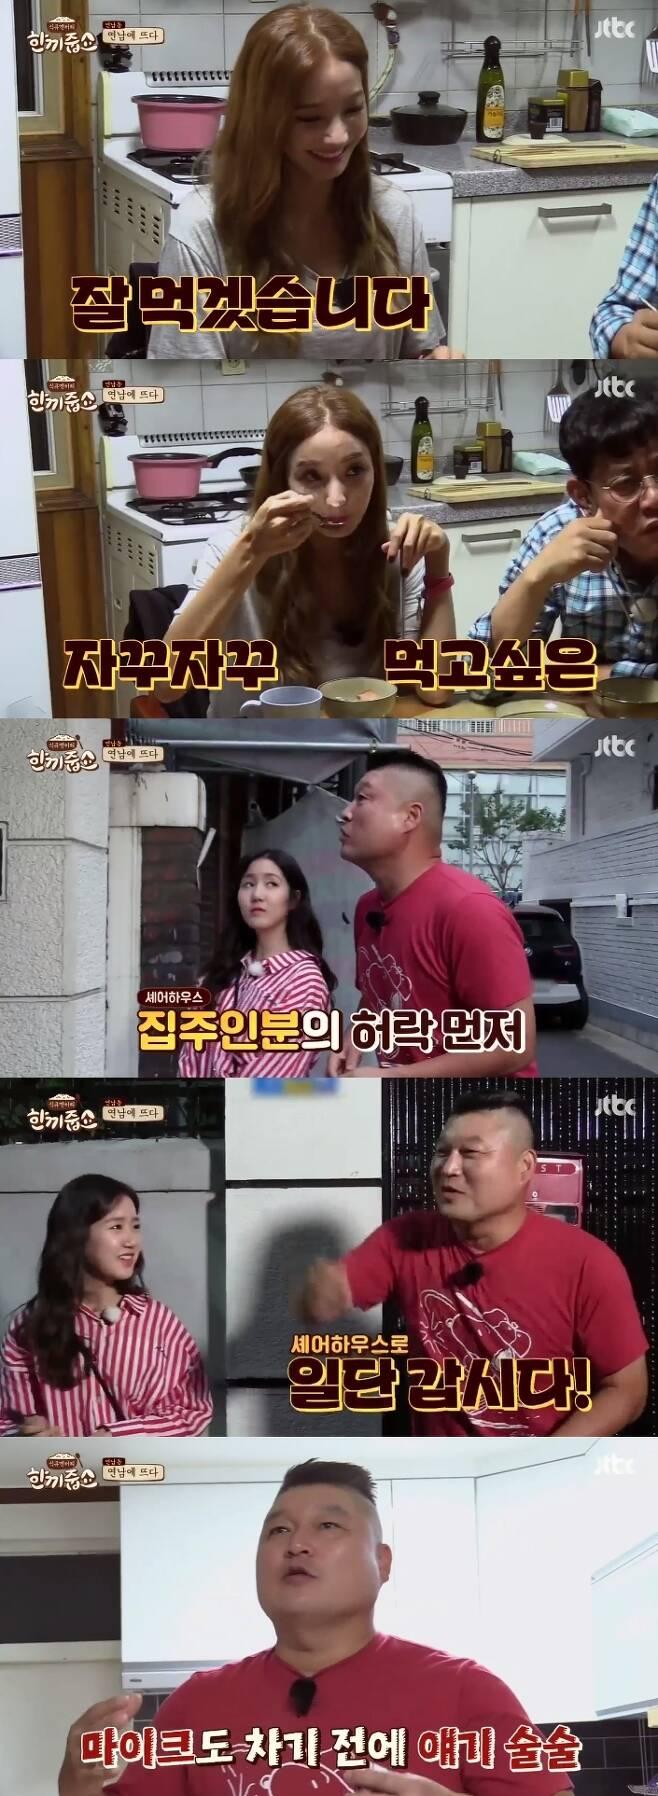 JTBC 한끼줍쇼 © News1